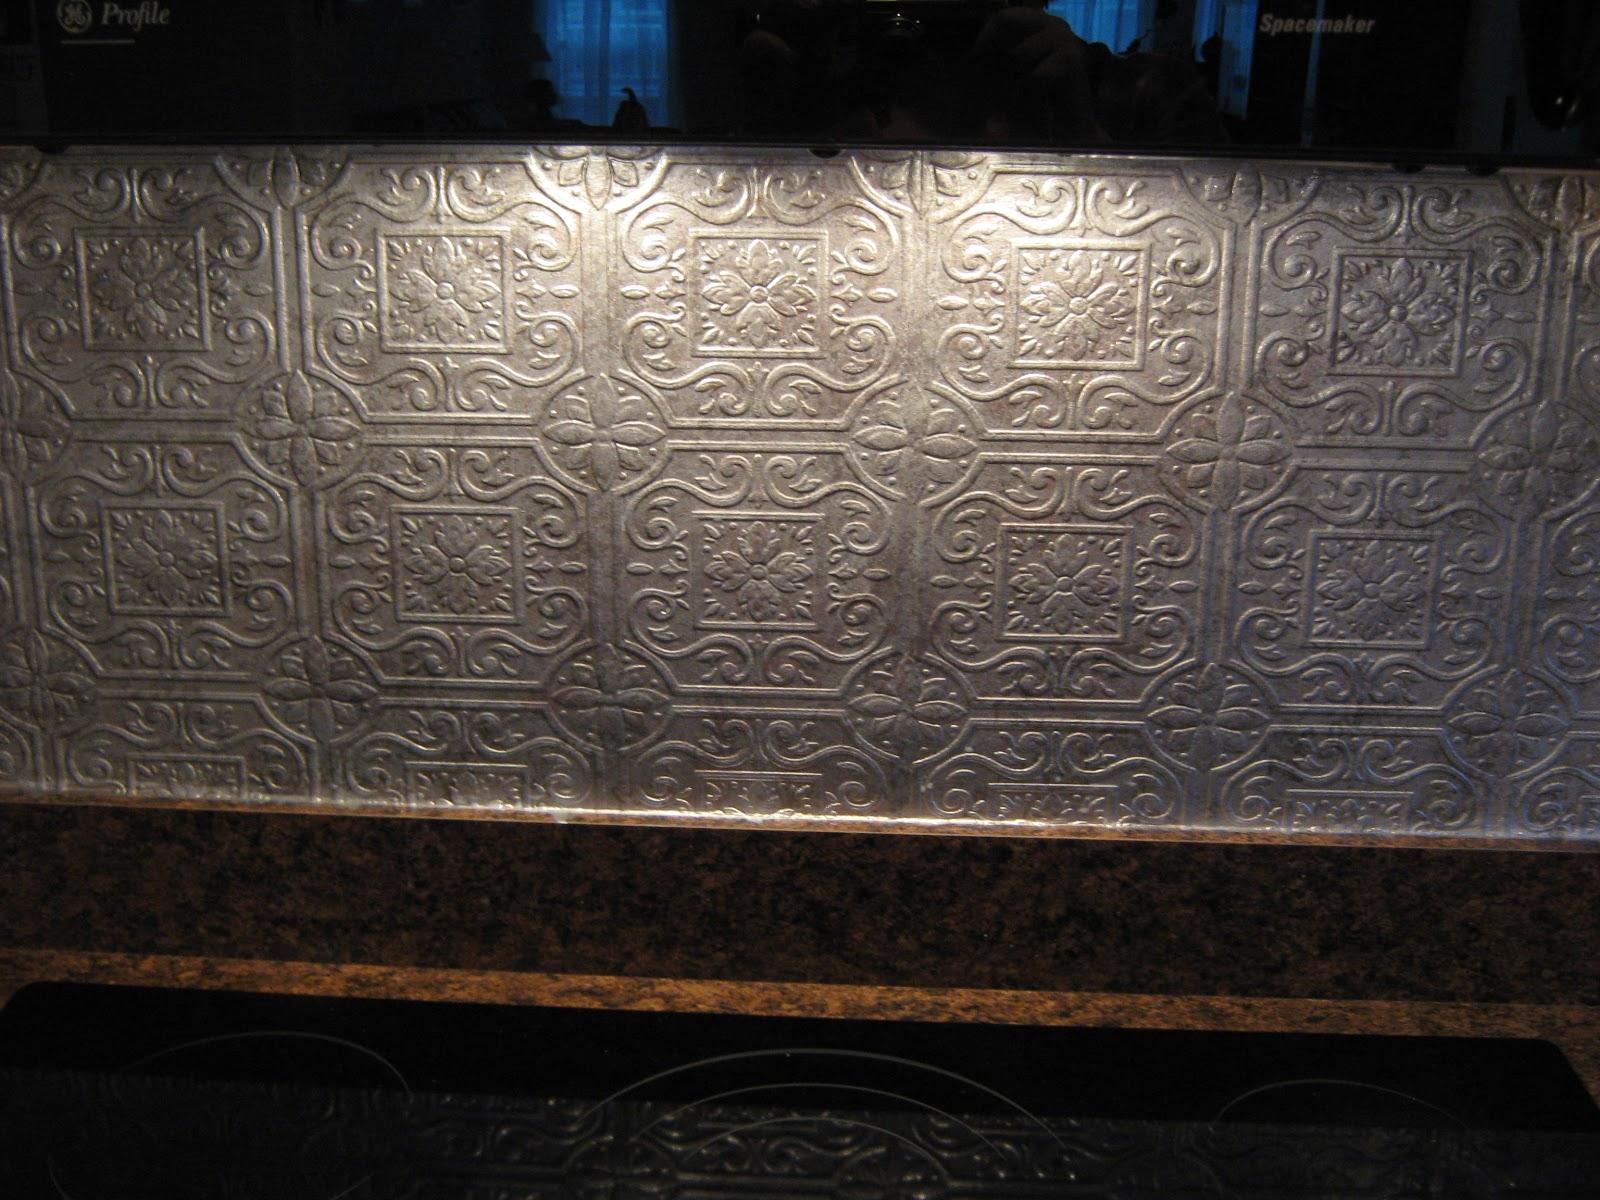 Wallpaper as back splash wallpapersafari for Vinyl wallpaper backsplash